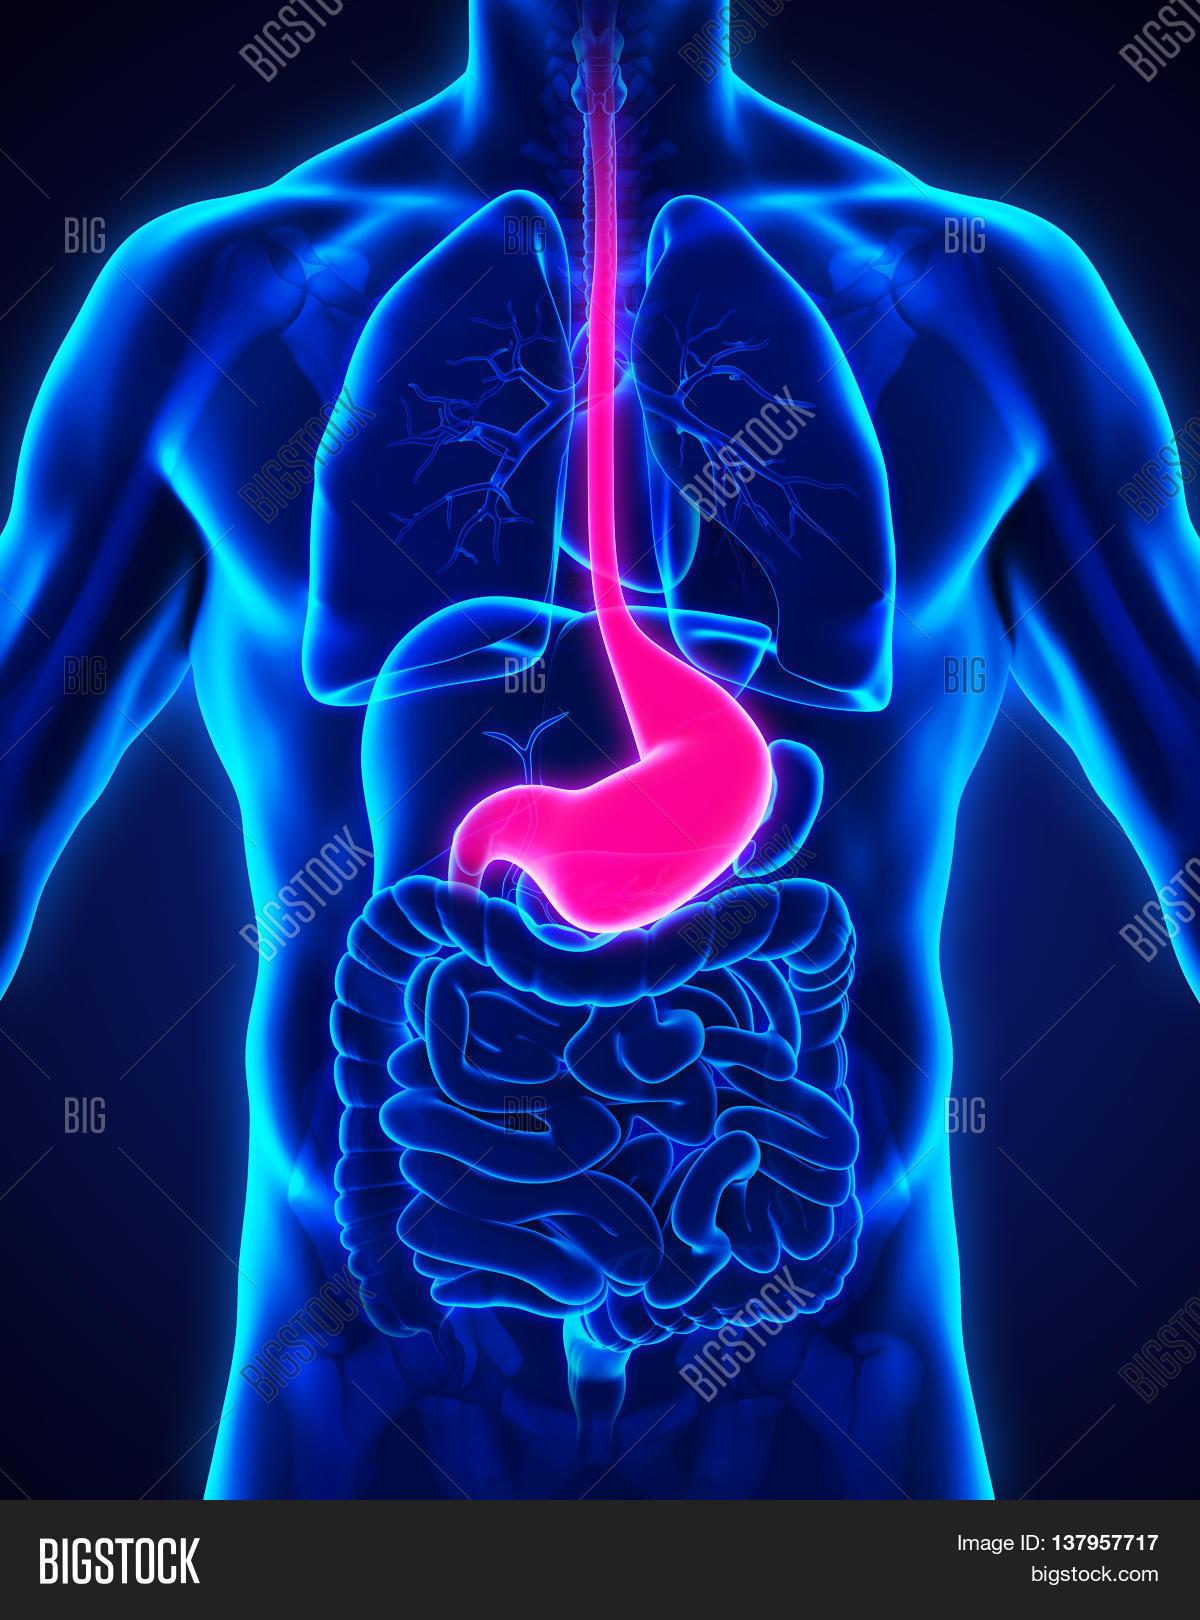 Human Stomach Anatomy Image Photo Free Trial Bigstock